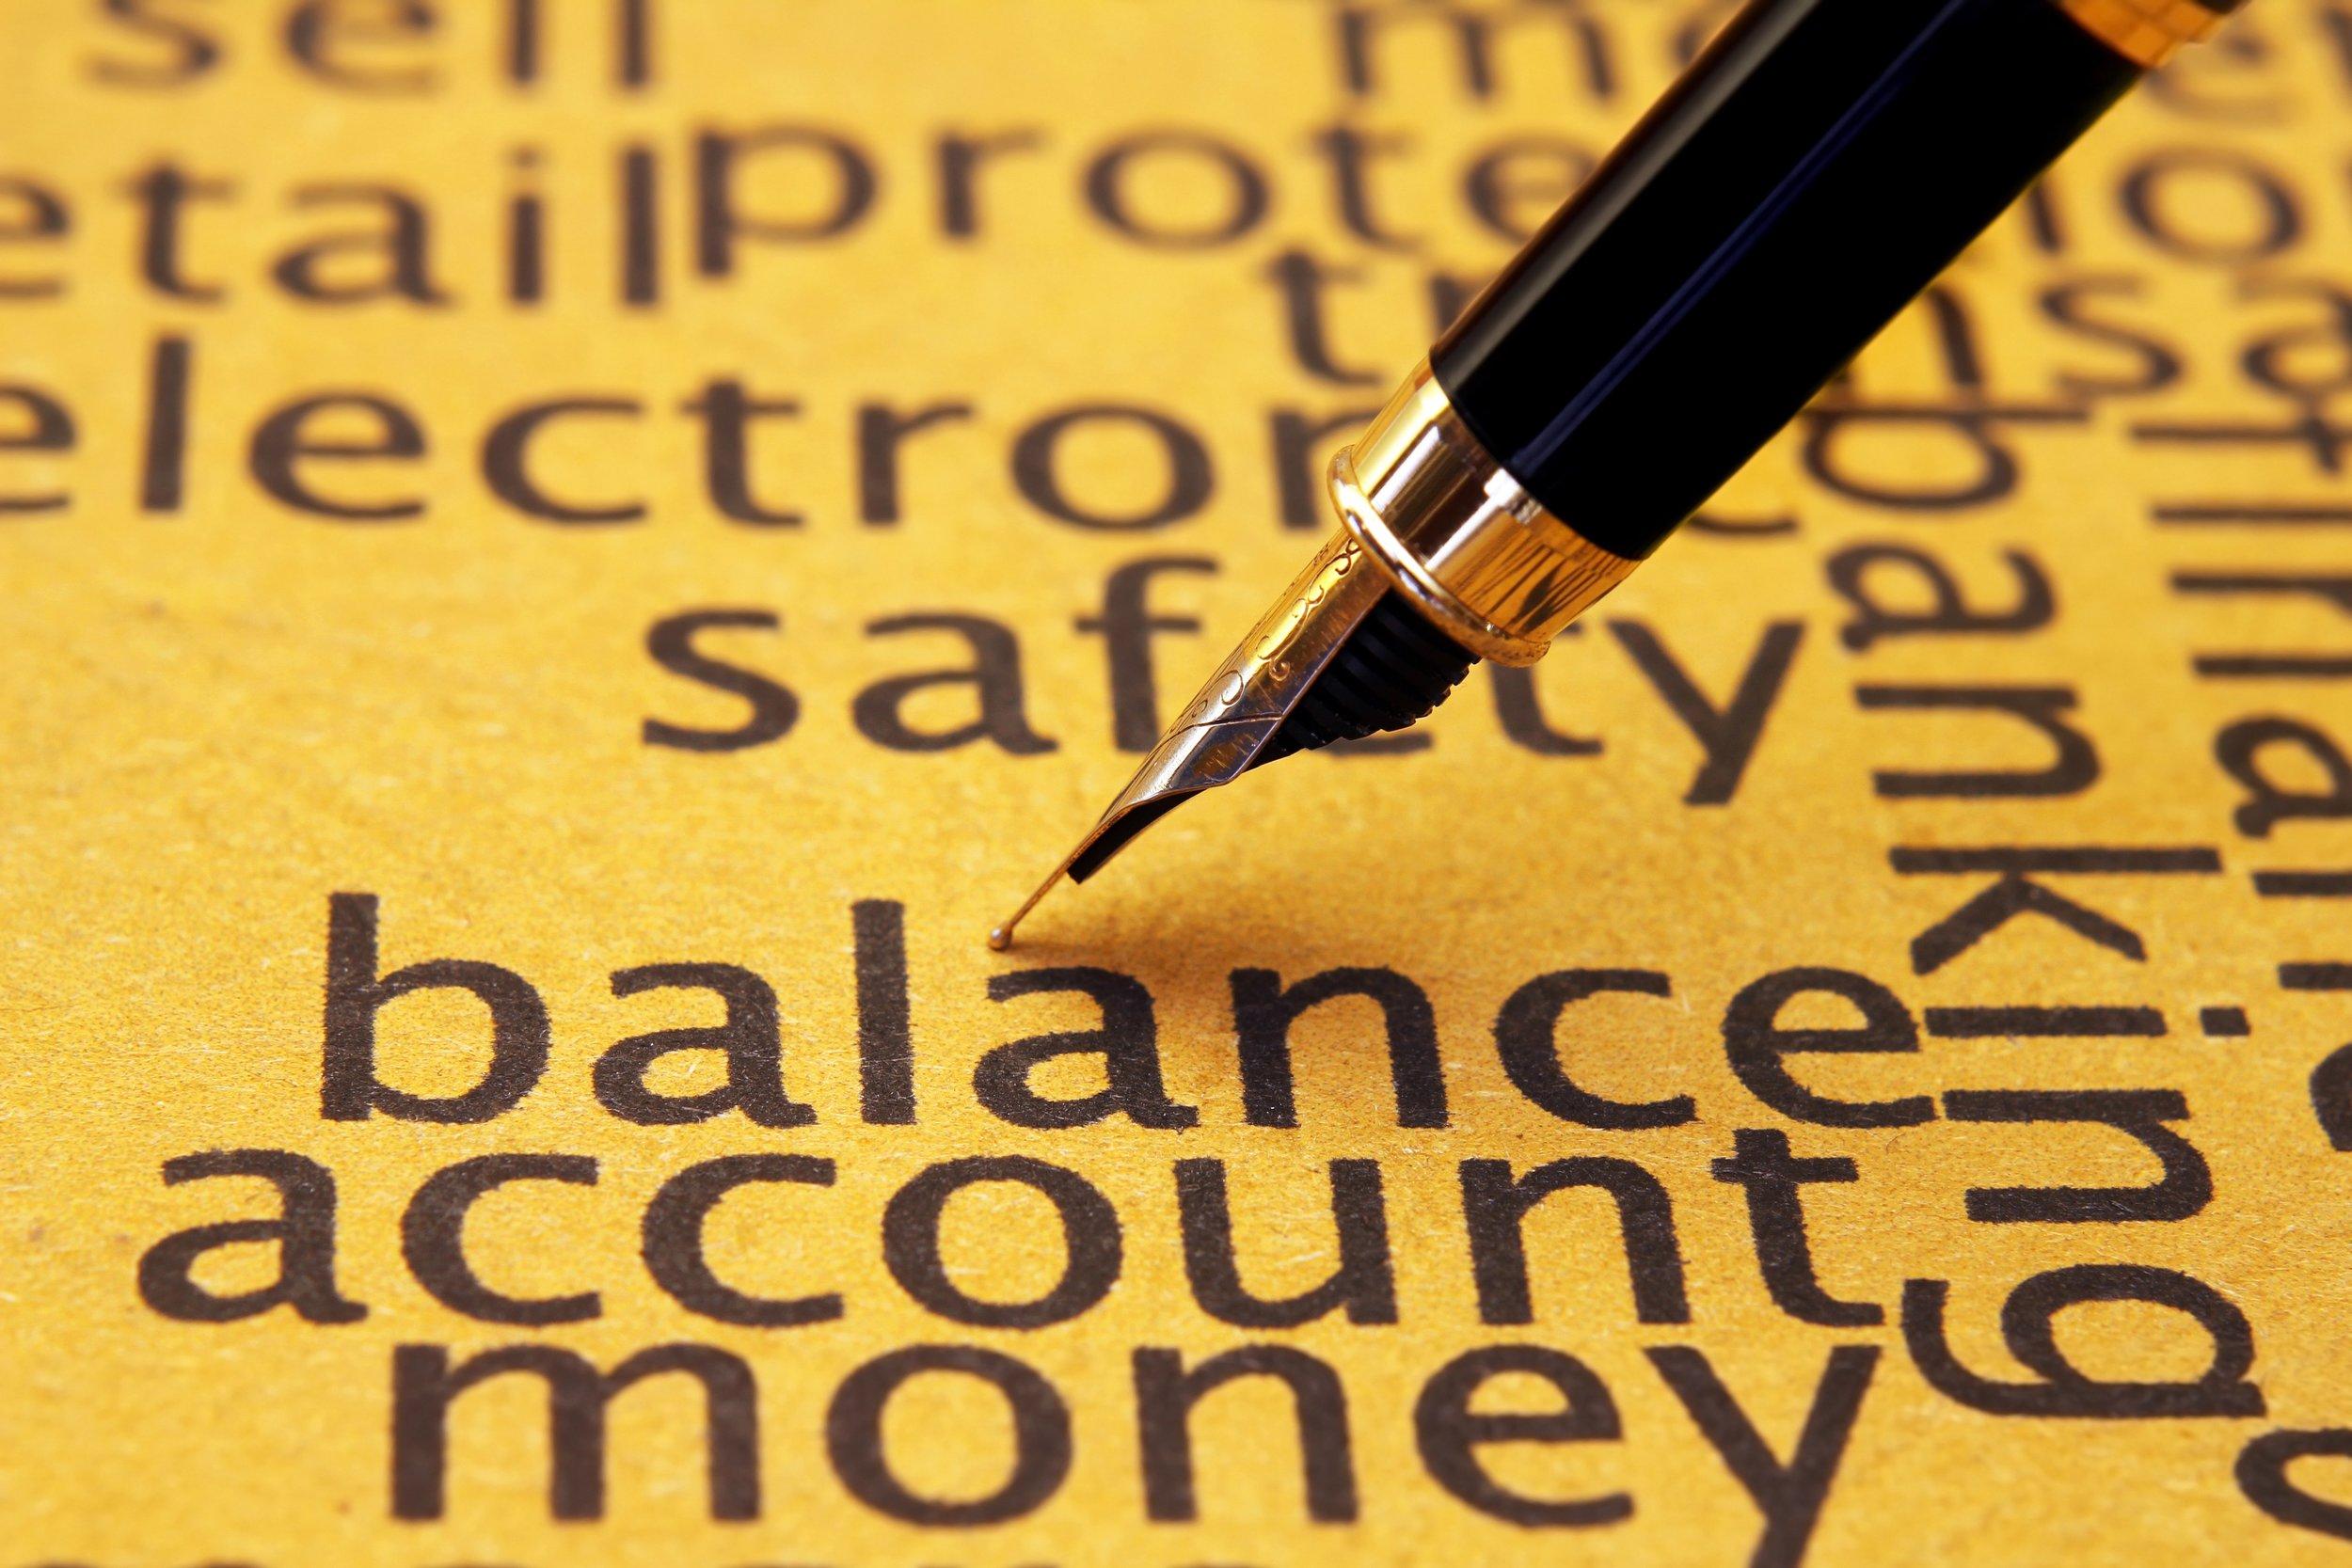 balance-account-money_GJpFdSwd.jpg